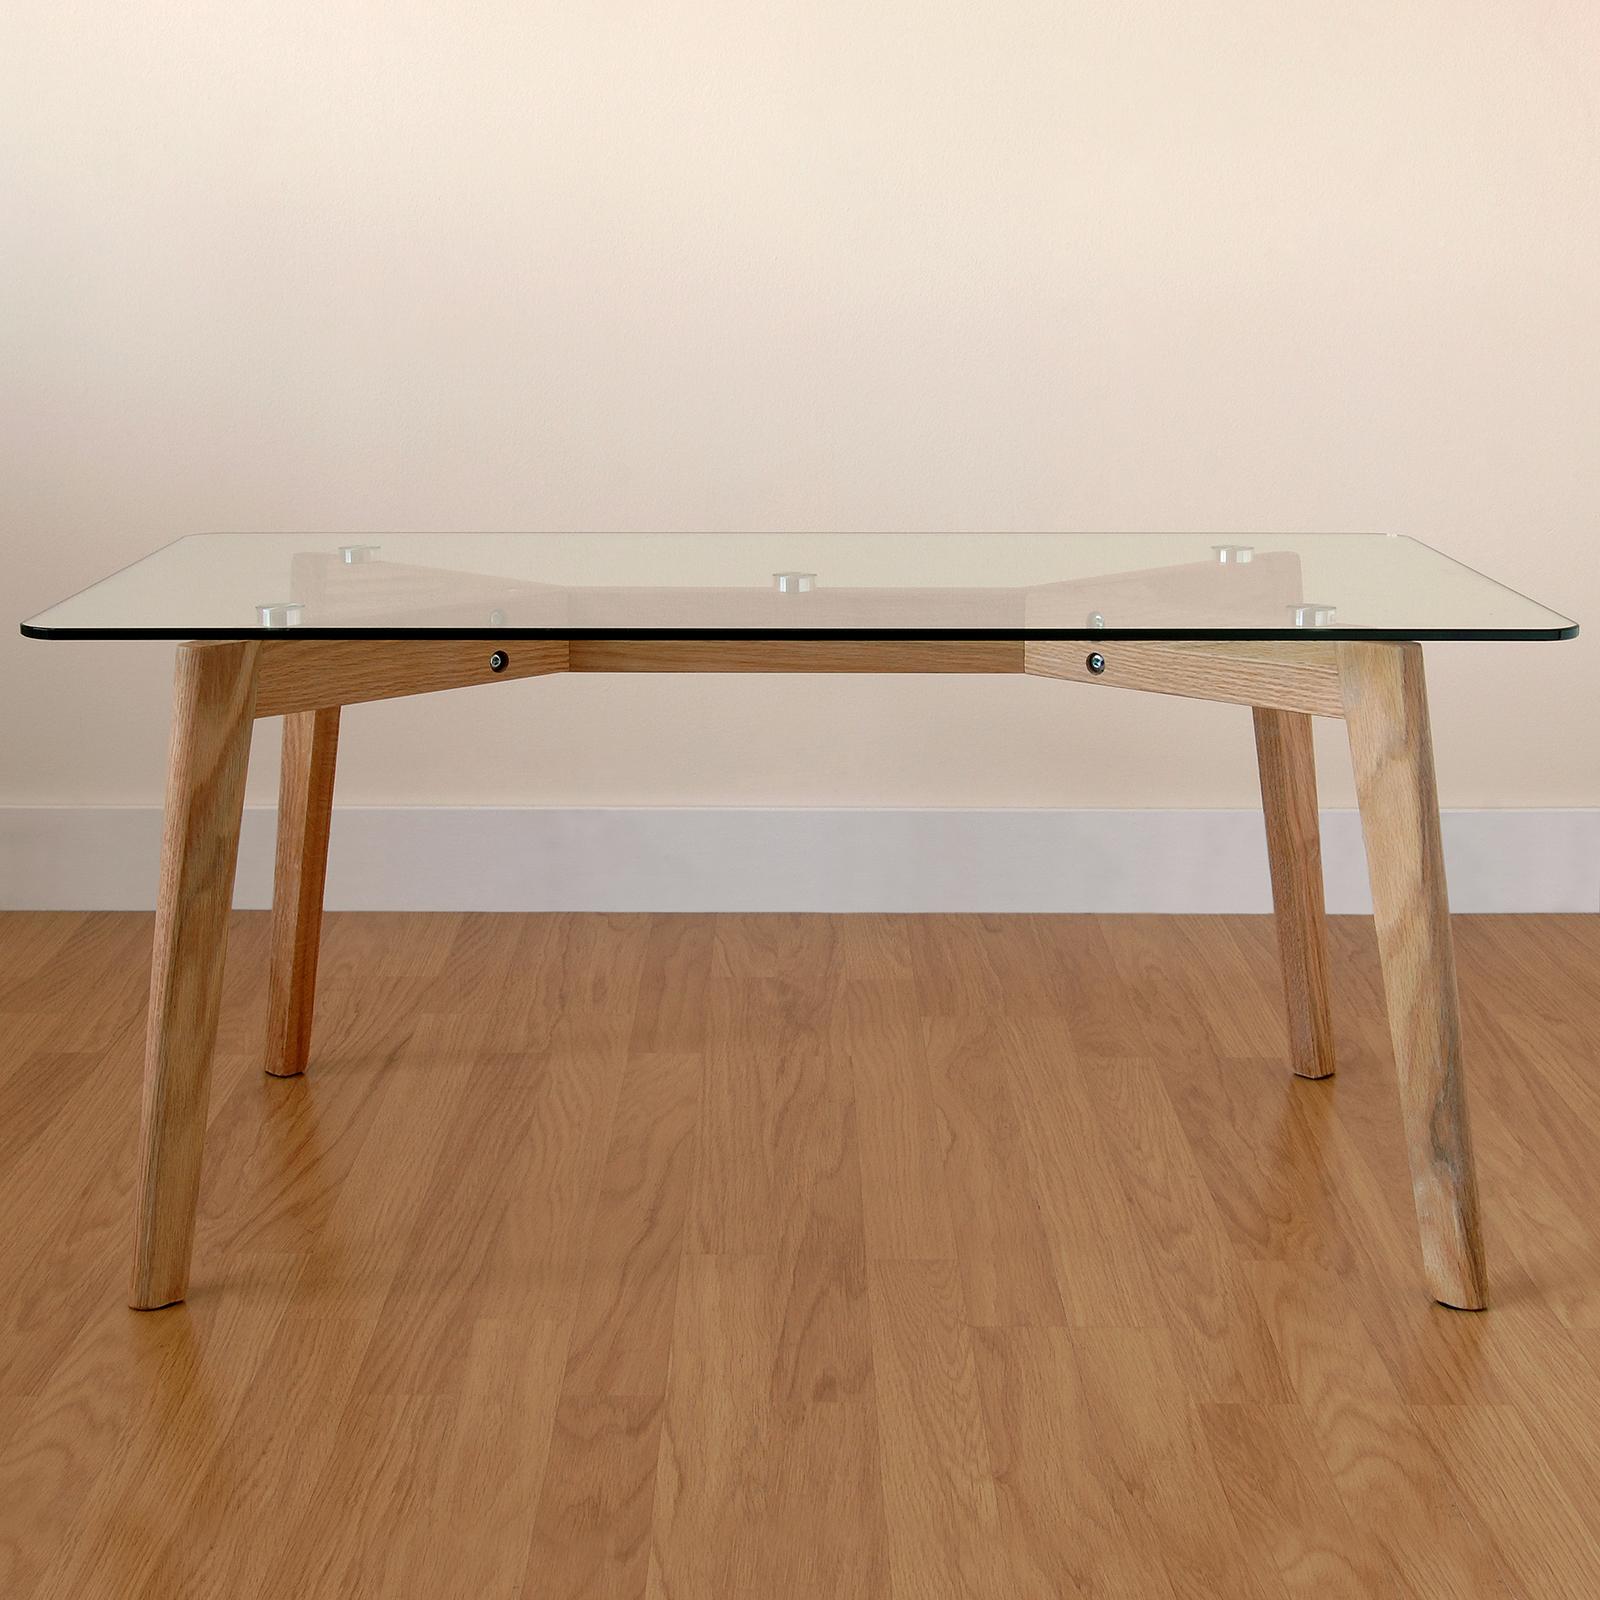 Grand moderne rectangulaire verre transparent salon caf - Protege table rectangulaire ...